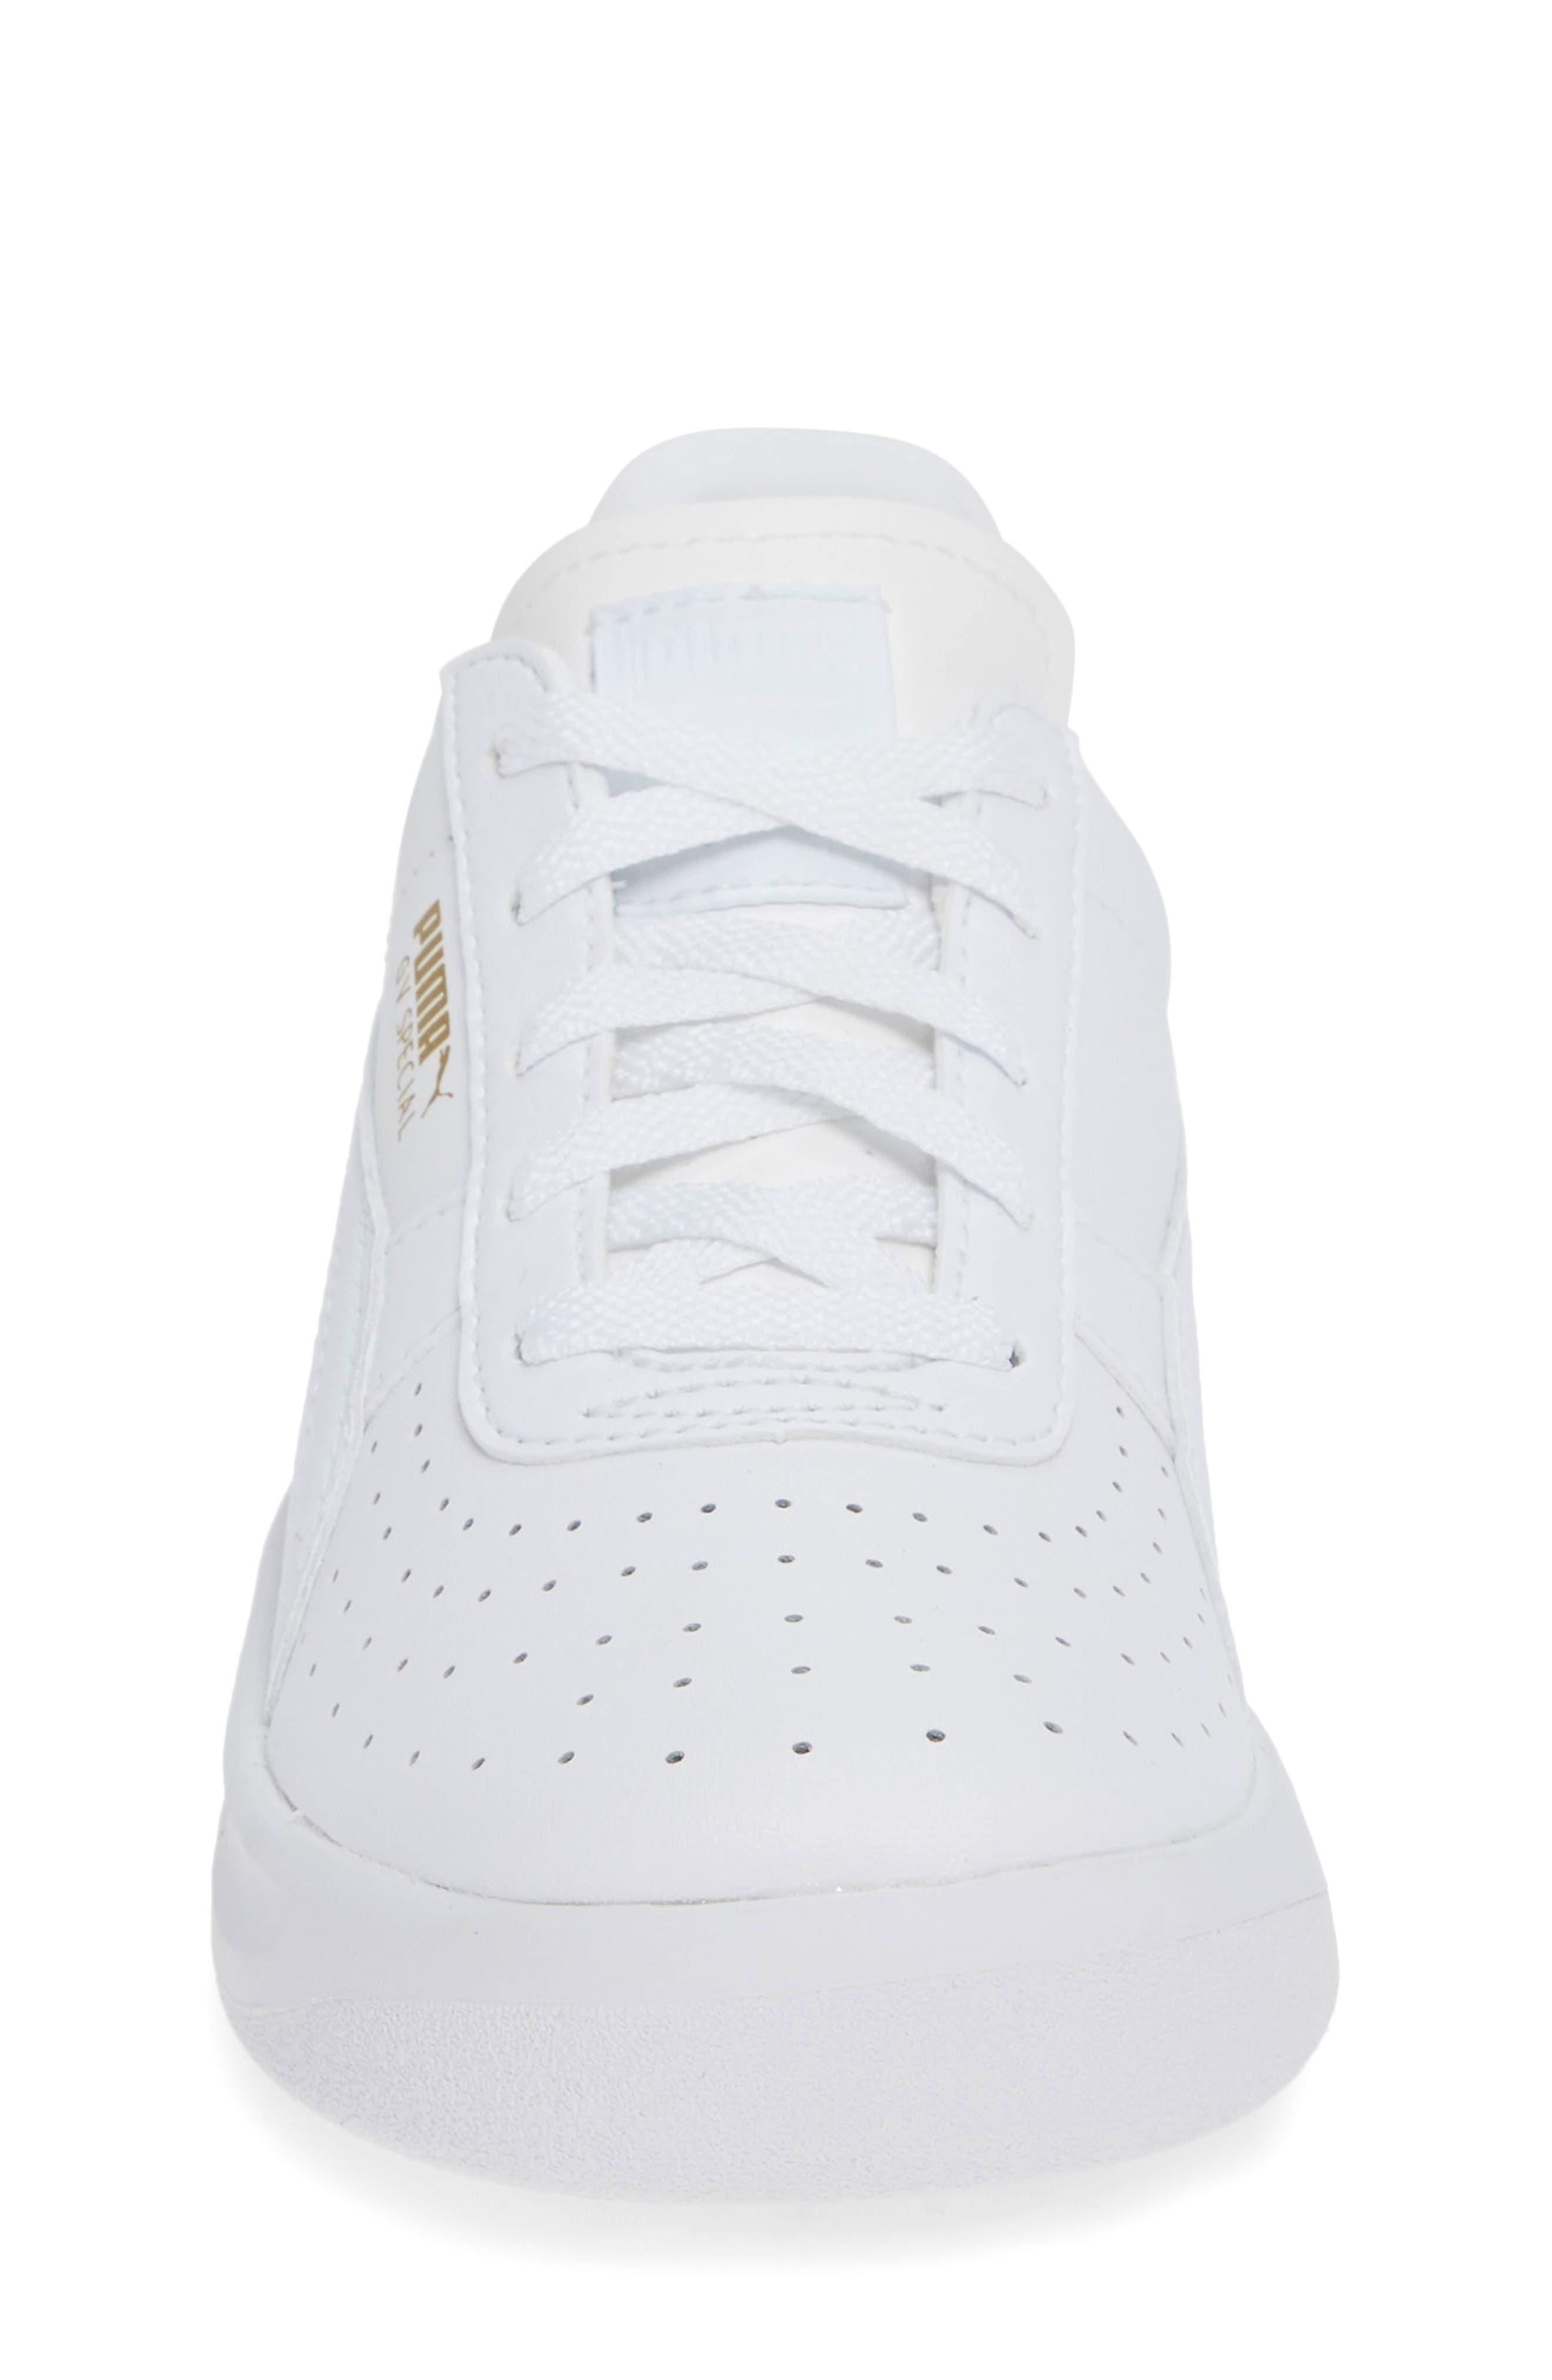 PUMA, 'GV Special' Sneaker, Alternate thumbnail 4, color, PUMA WHITE-PUMA TEAM GOLD